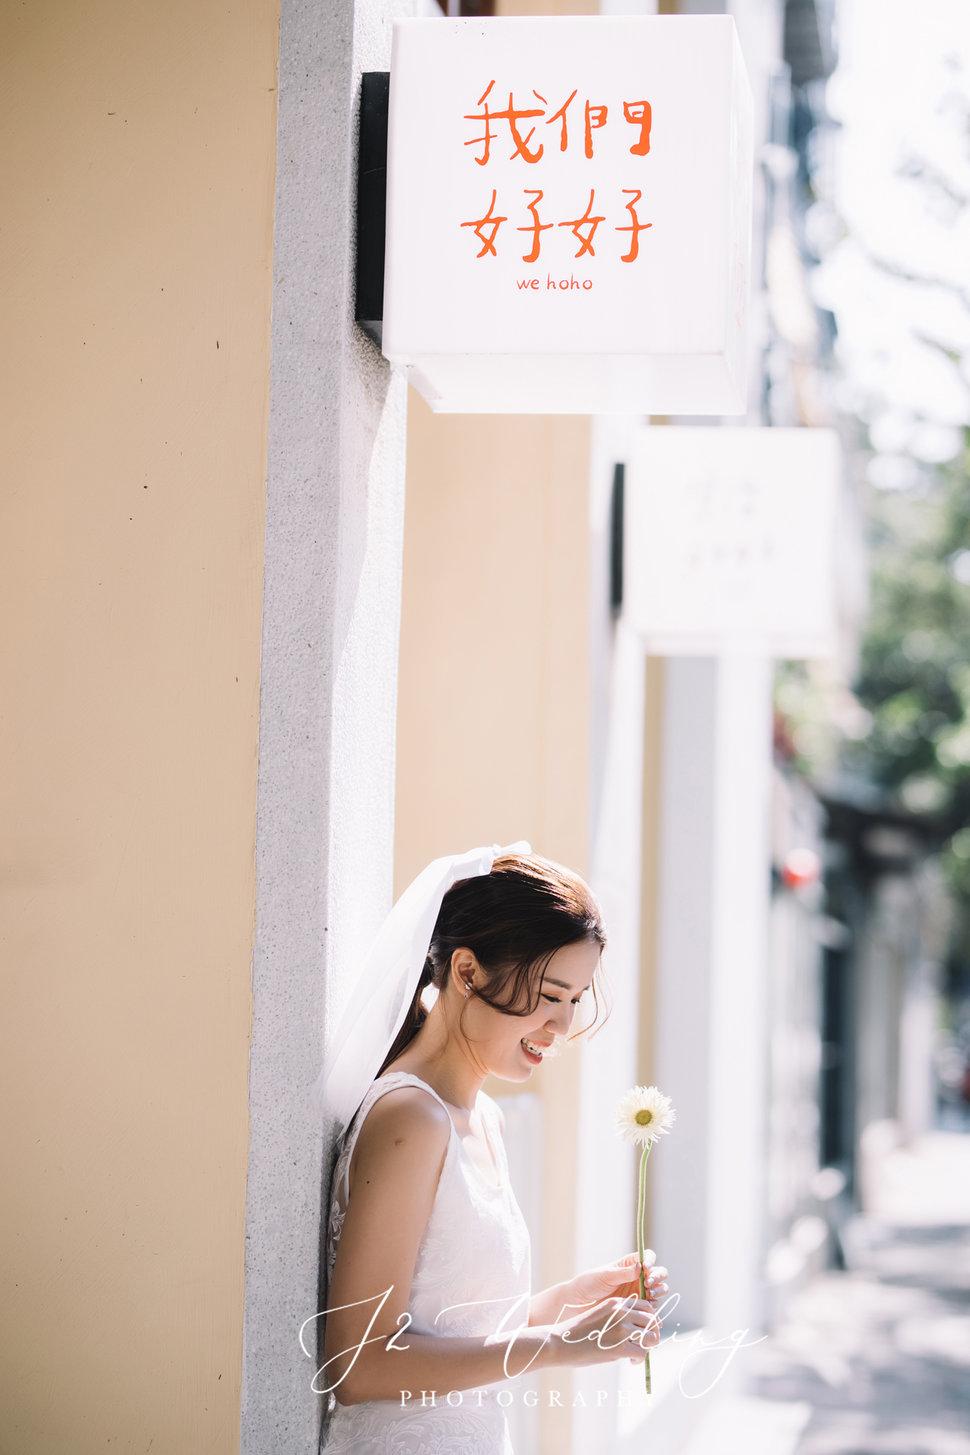 069A6679 - J2 wedding 中壢《結婚吧》